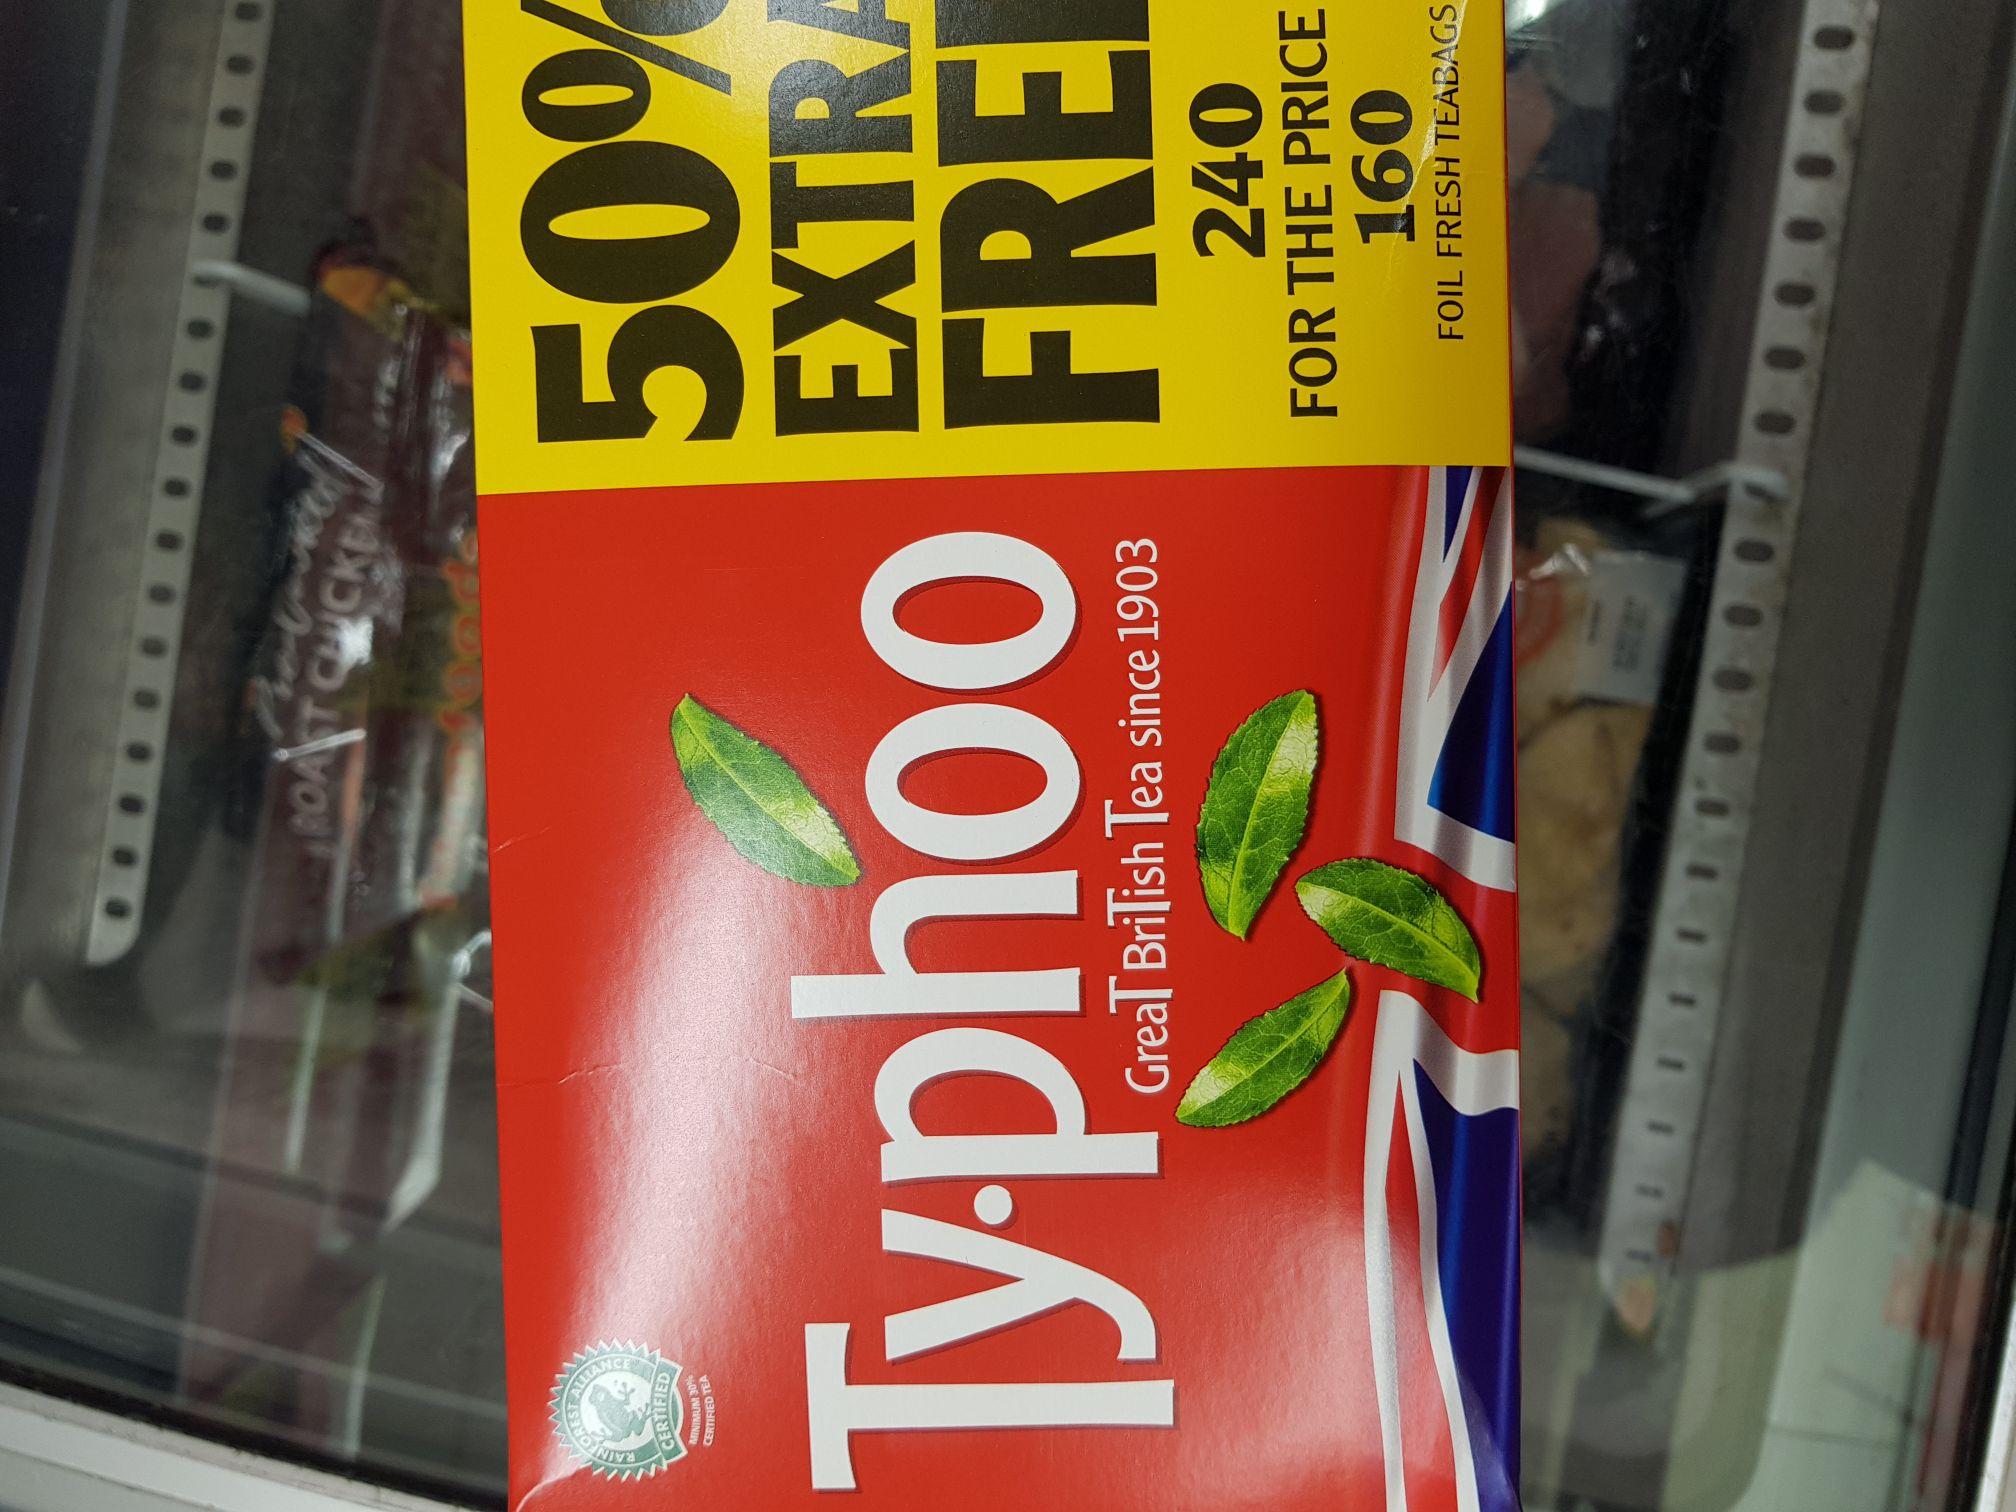 2 for £5 typhoo 240 tea bags @ farmfoods